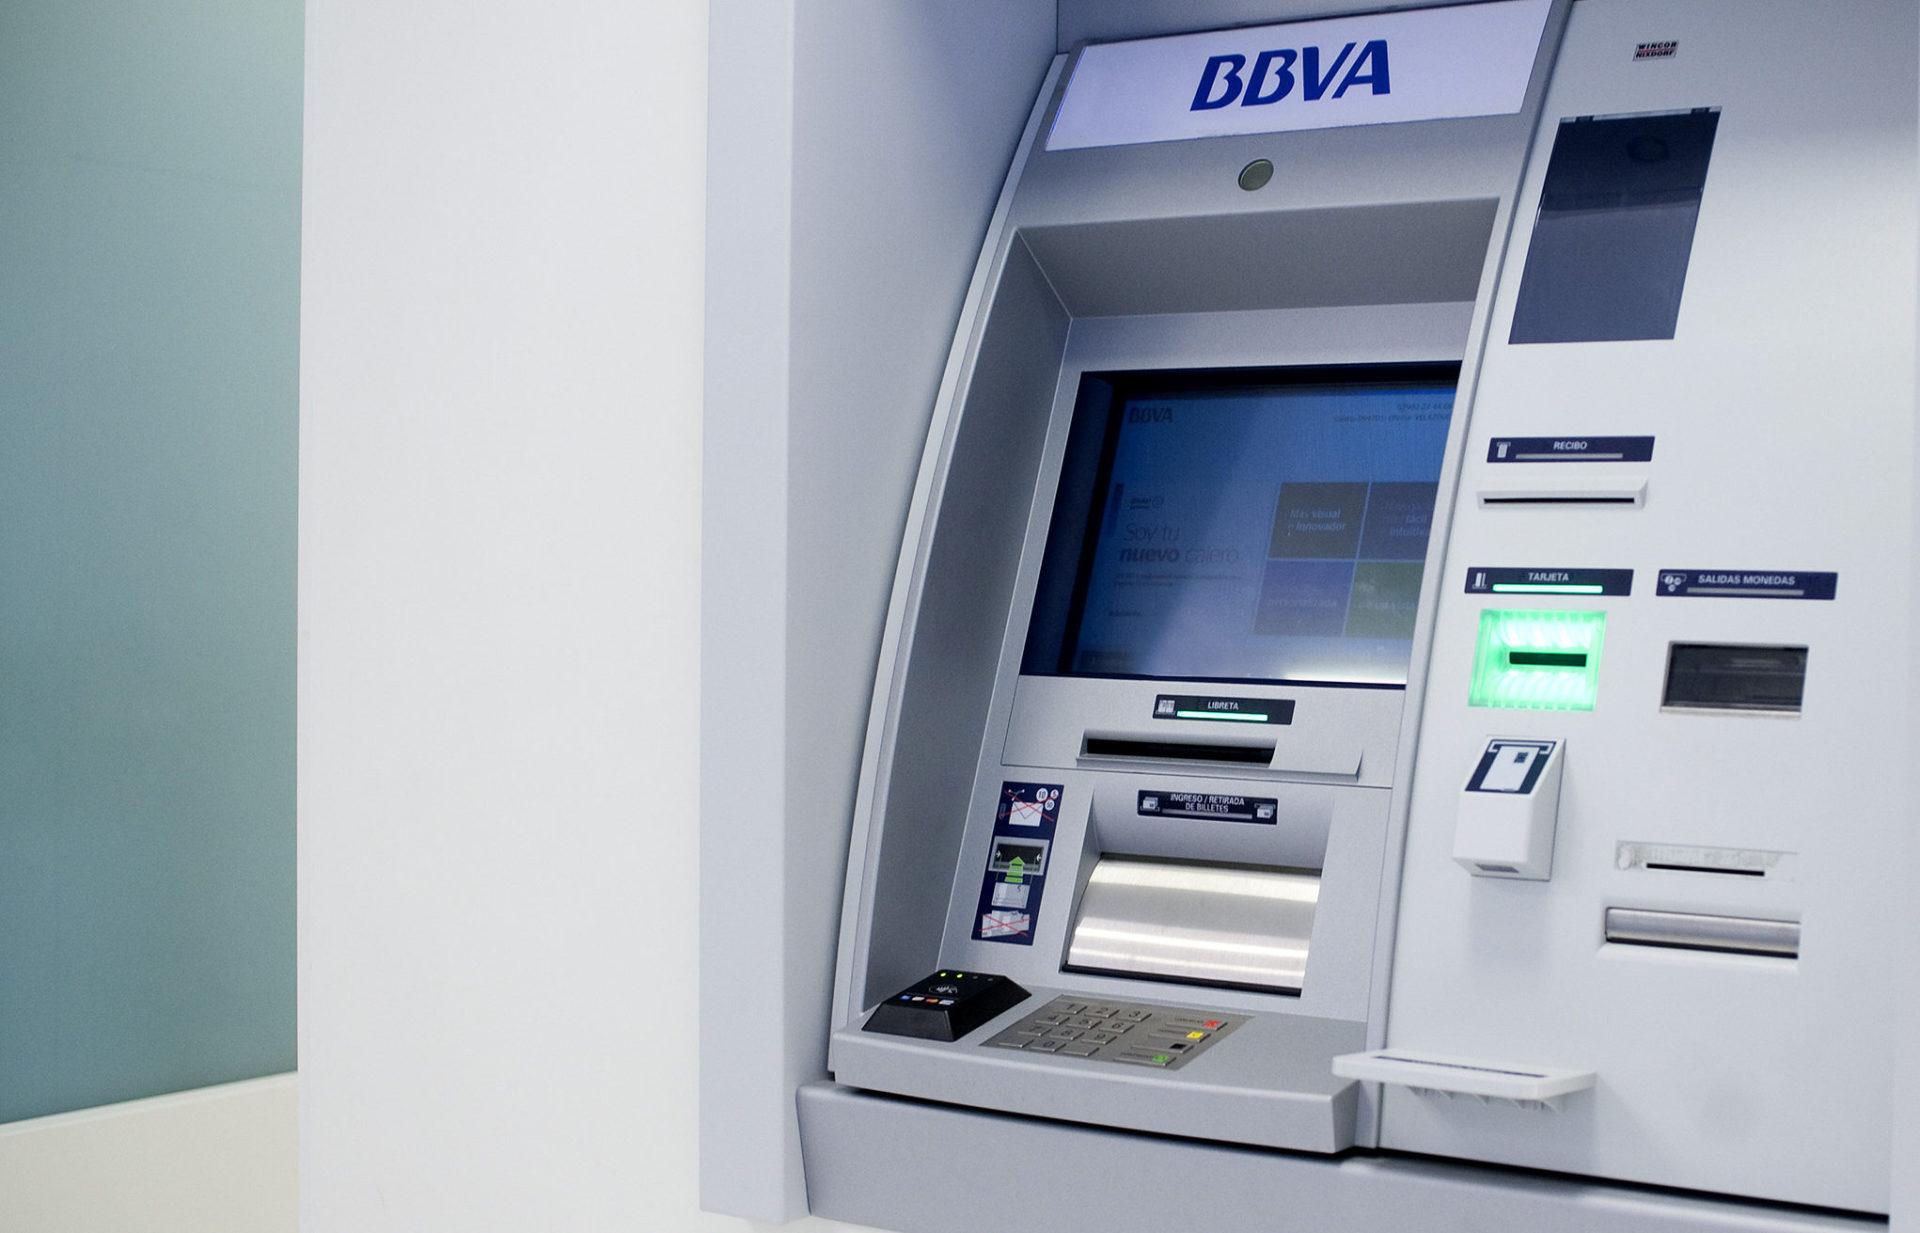 hal-cash-micropago-pago-sin-tarjeta-bbva